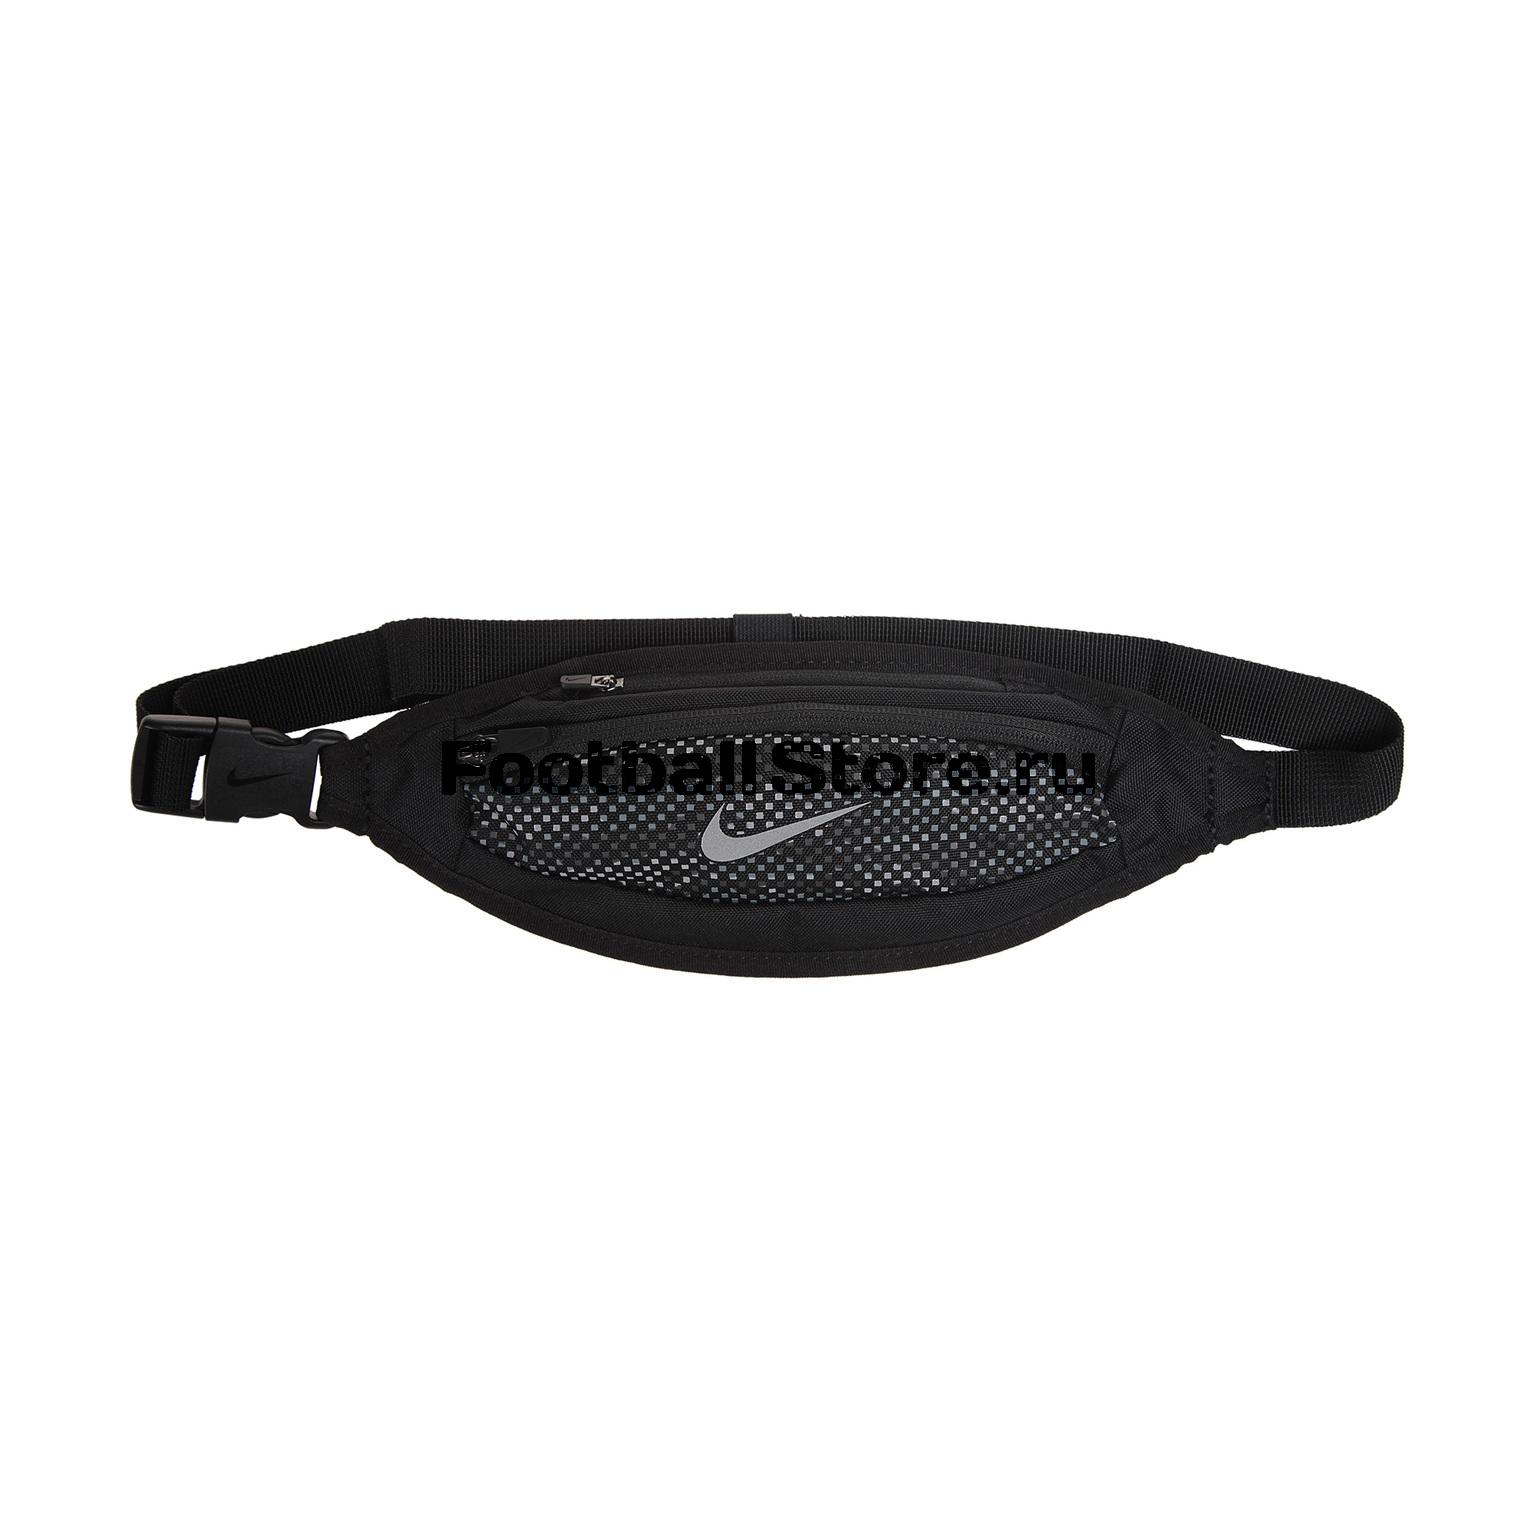 Сумки/Рюкзаки Nike Сумка на пояс Nike Vapor Flash Waistpack 2.0 N.RL.59.078.OS nike сумка на пояс женская nike